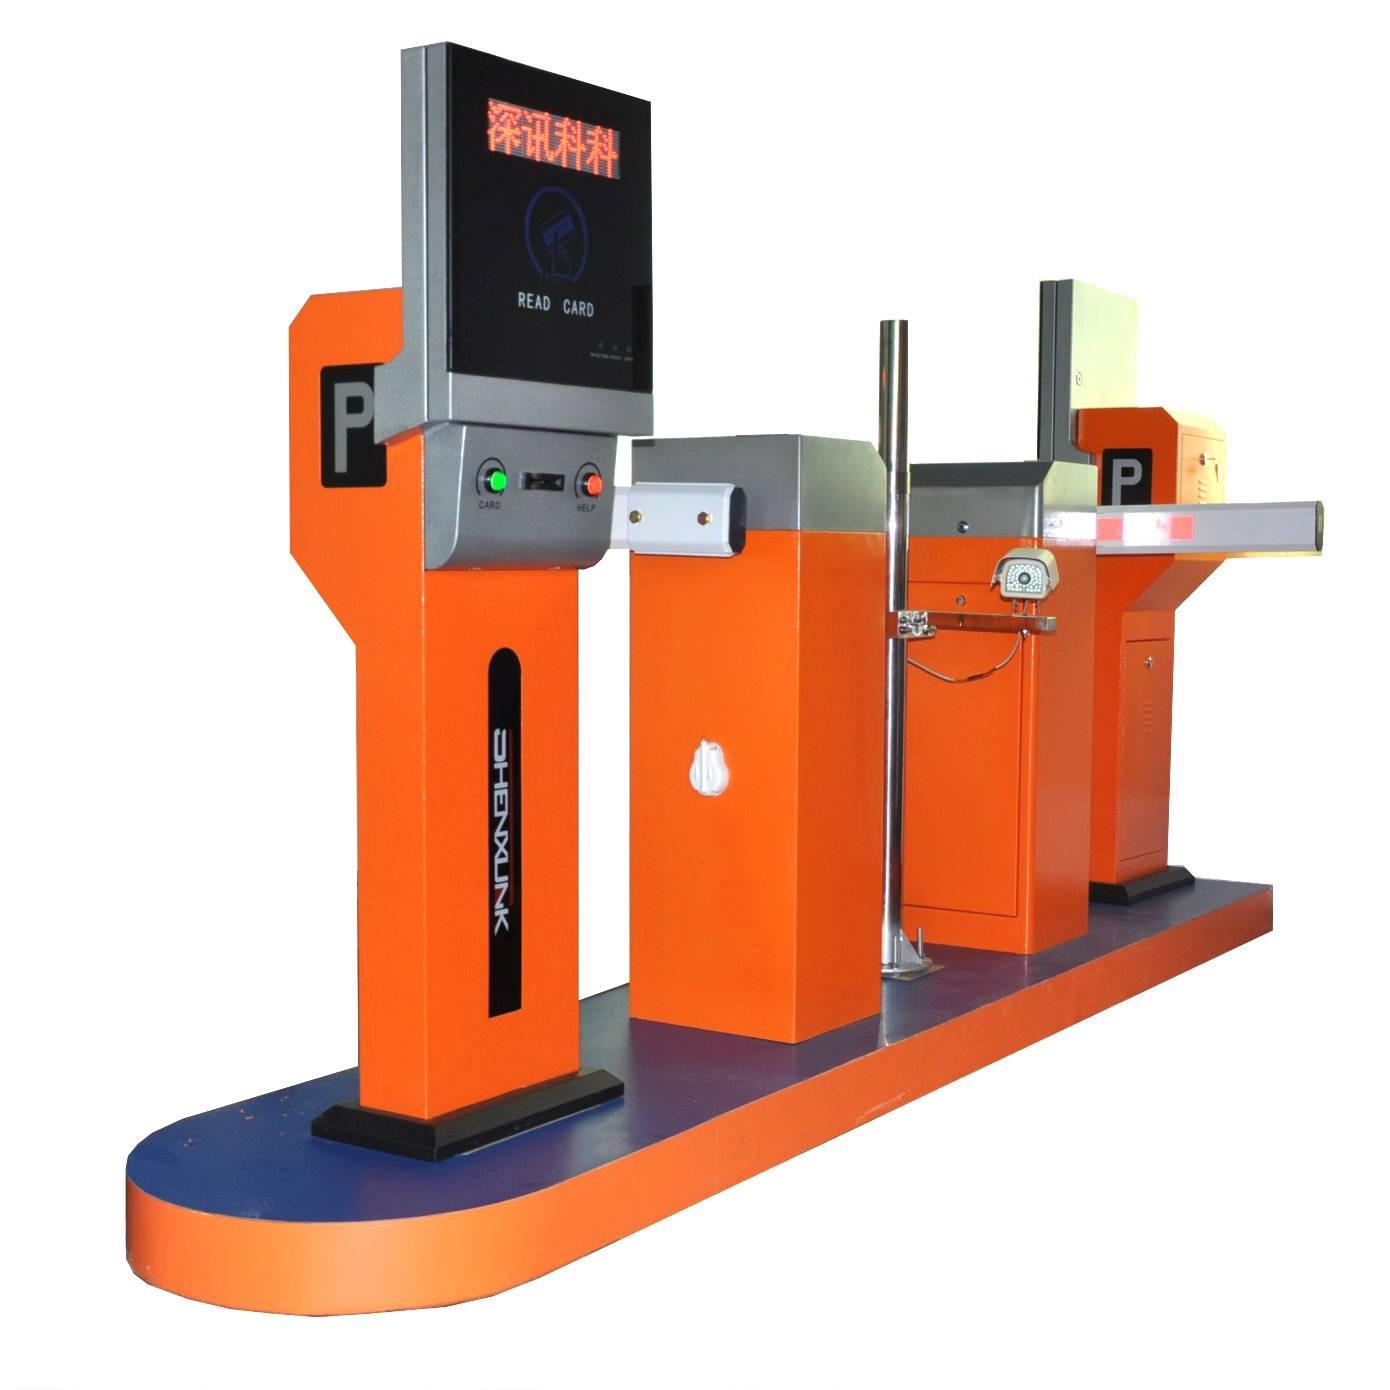 RFID Car Park Management System - Thinkpark Technology Co.,Ltd